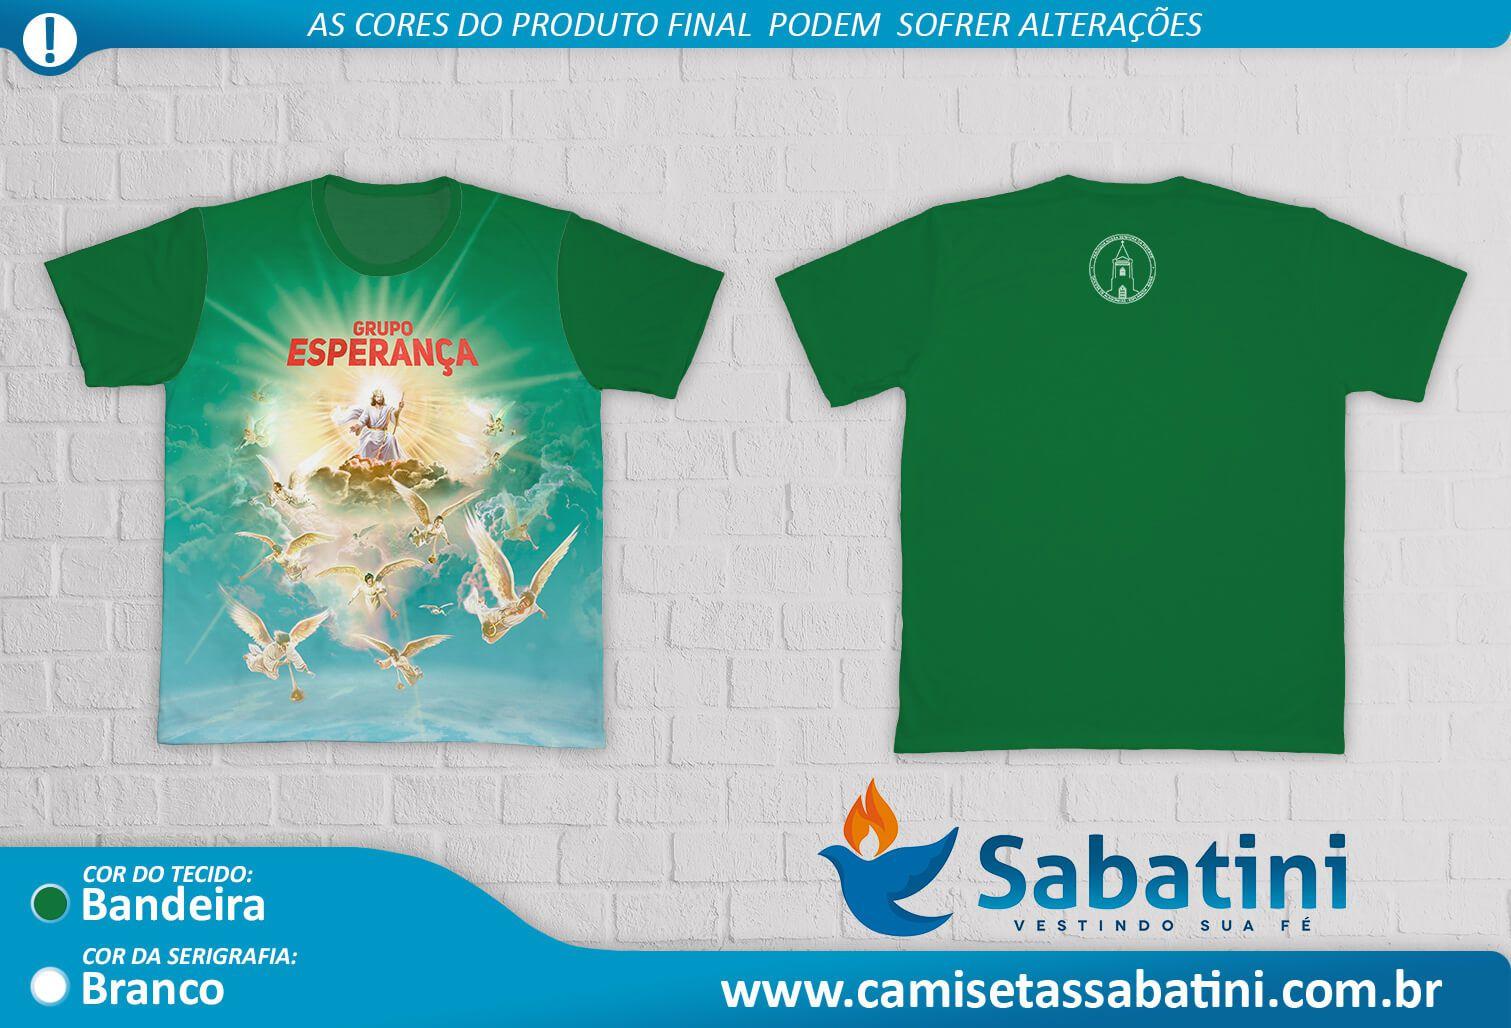 Camiseta Personalizada - Grupo Esperança - Esplanada BA - ID13967778  - Camisetas Sabatini